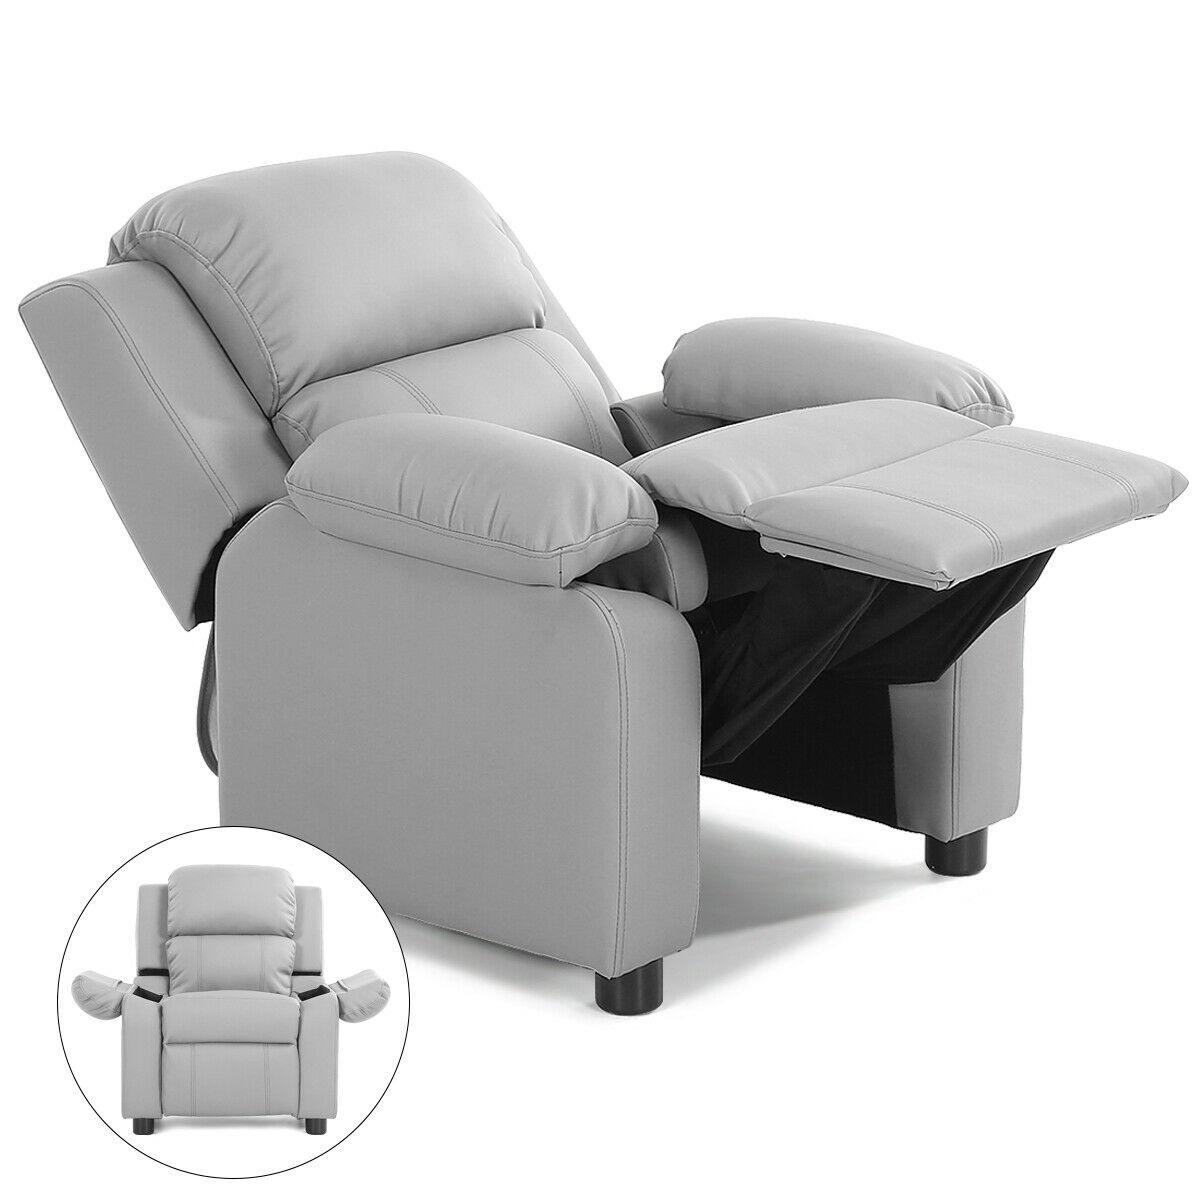 Deluxe Padded Kids Sofa Armchair Recliner Headrest Children